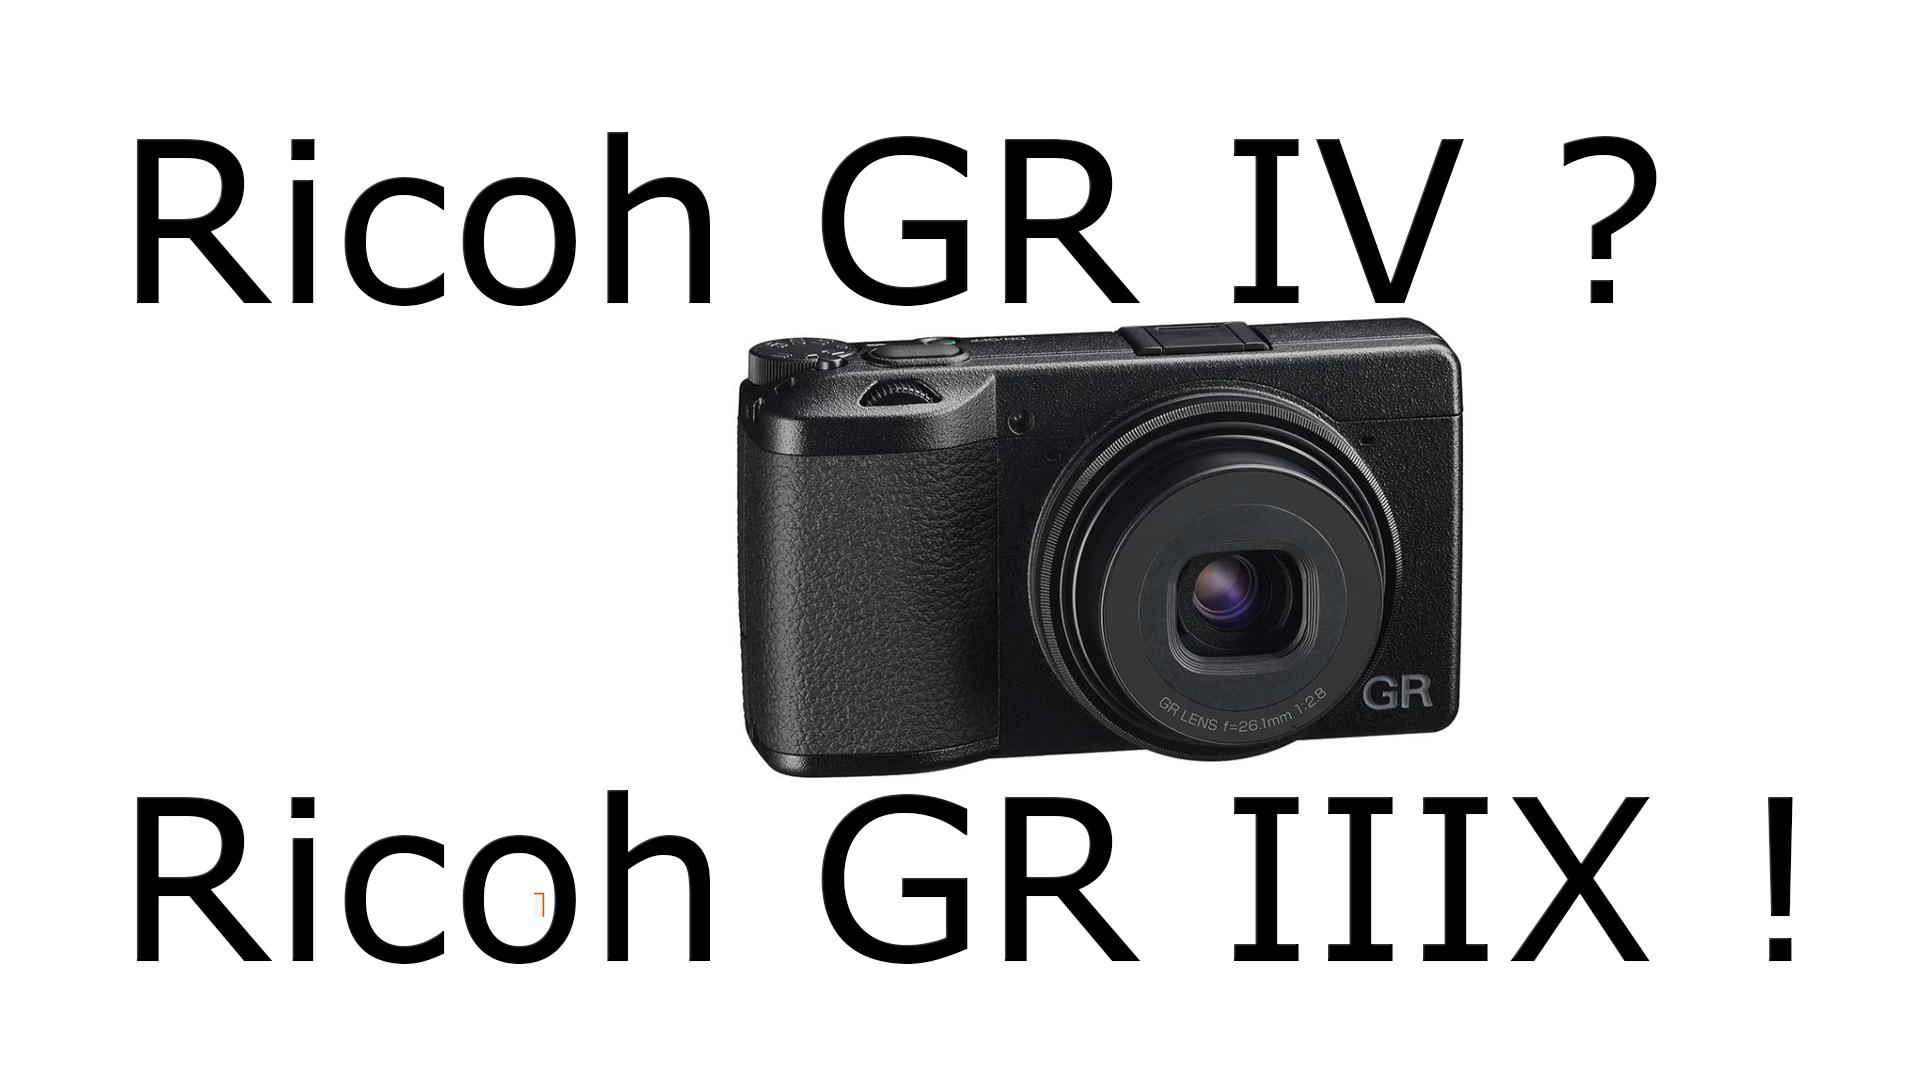 Ricog GR4 ? Ricoh GRiii !